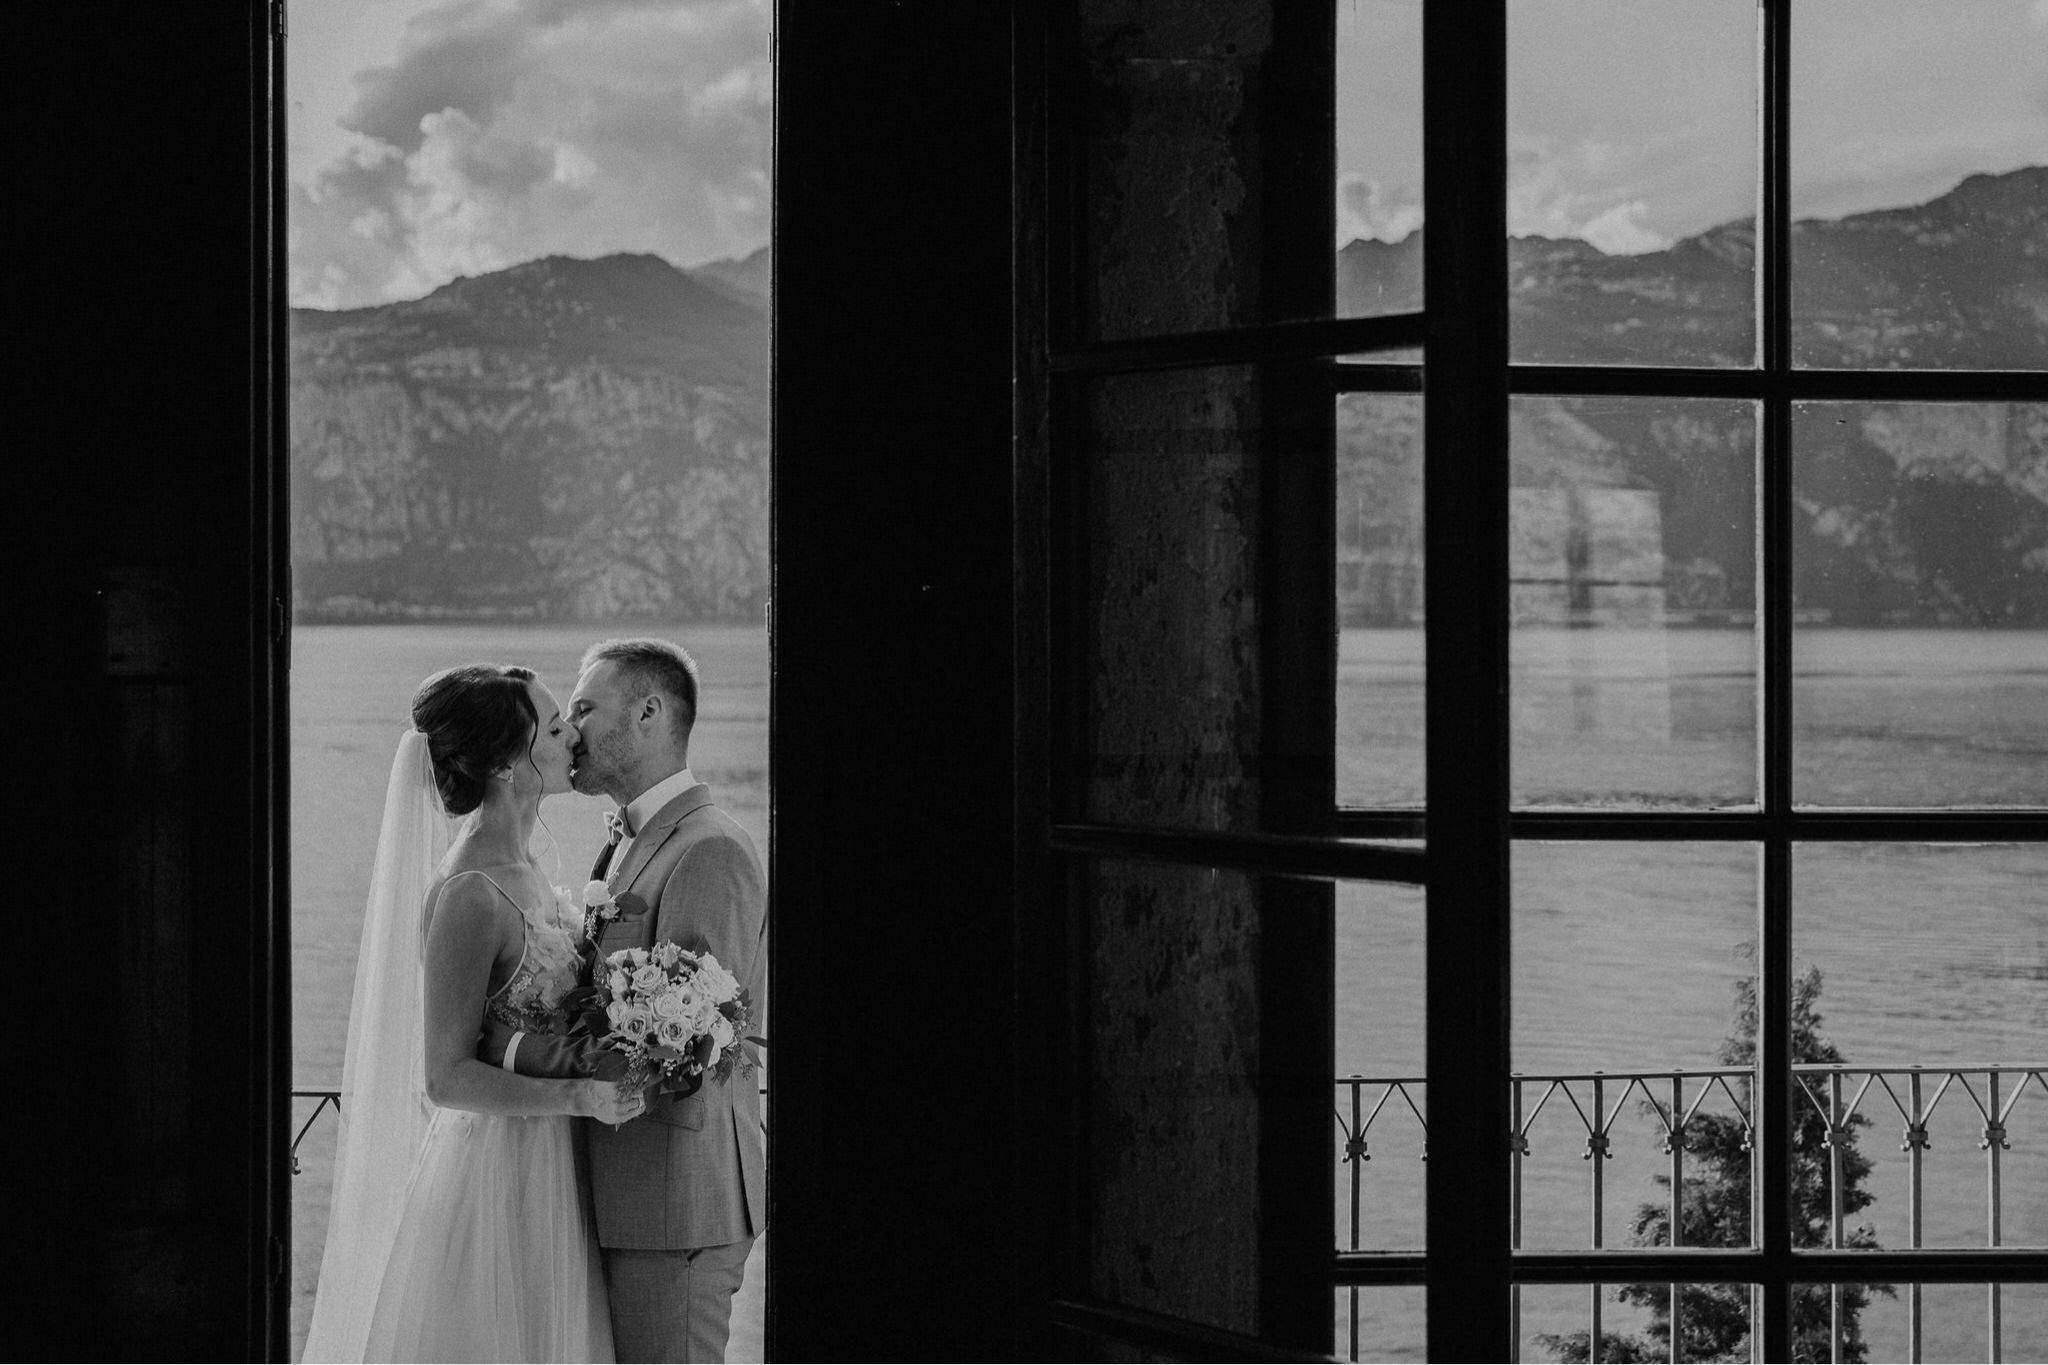 47 la 03 zeremonie 1247 weddinphotographer Hochzeitsfotograf newzealand hamilton Weddingphotography Stuttgart 1